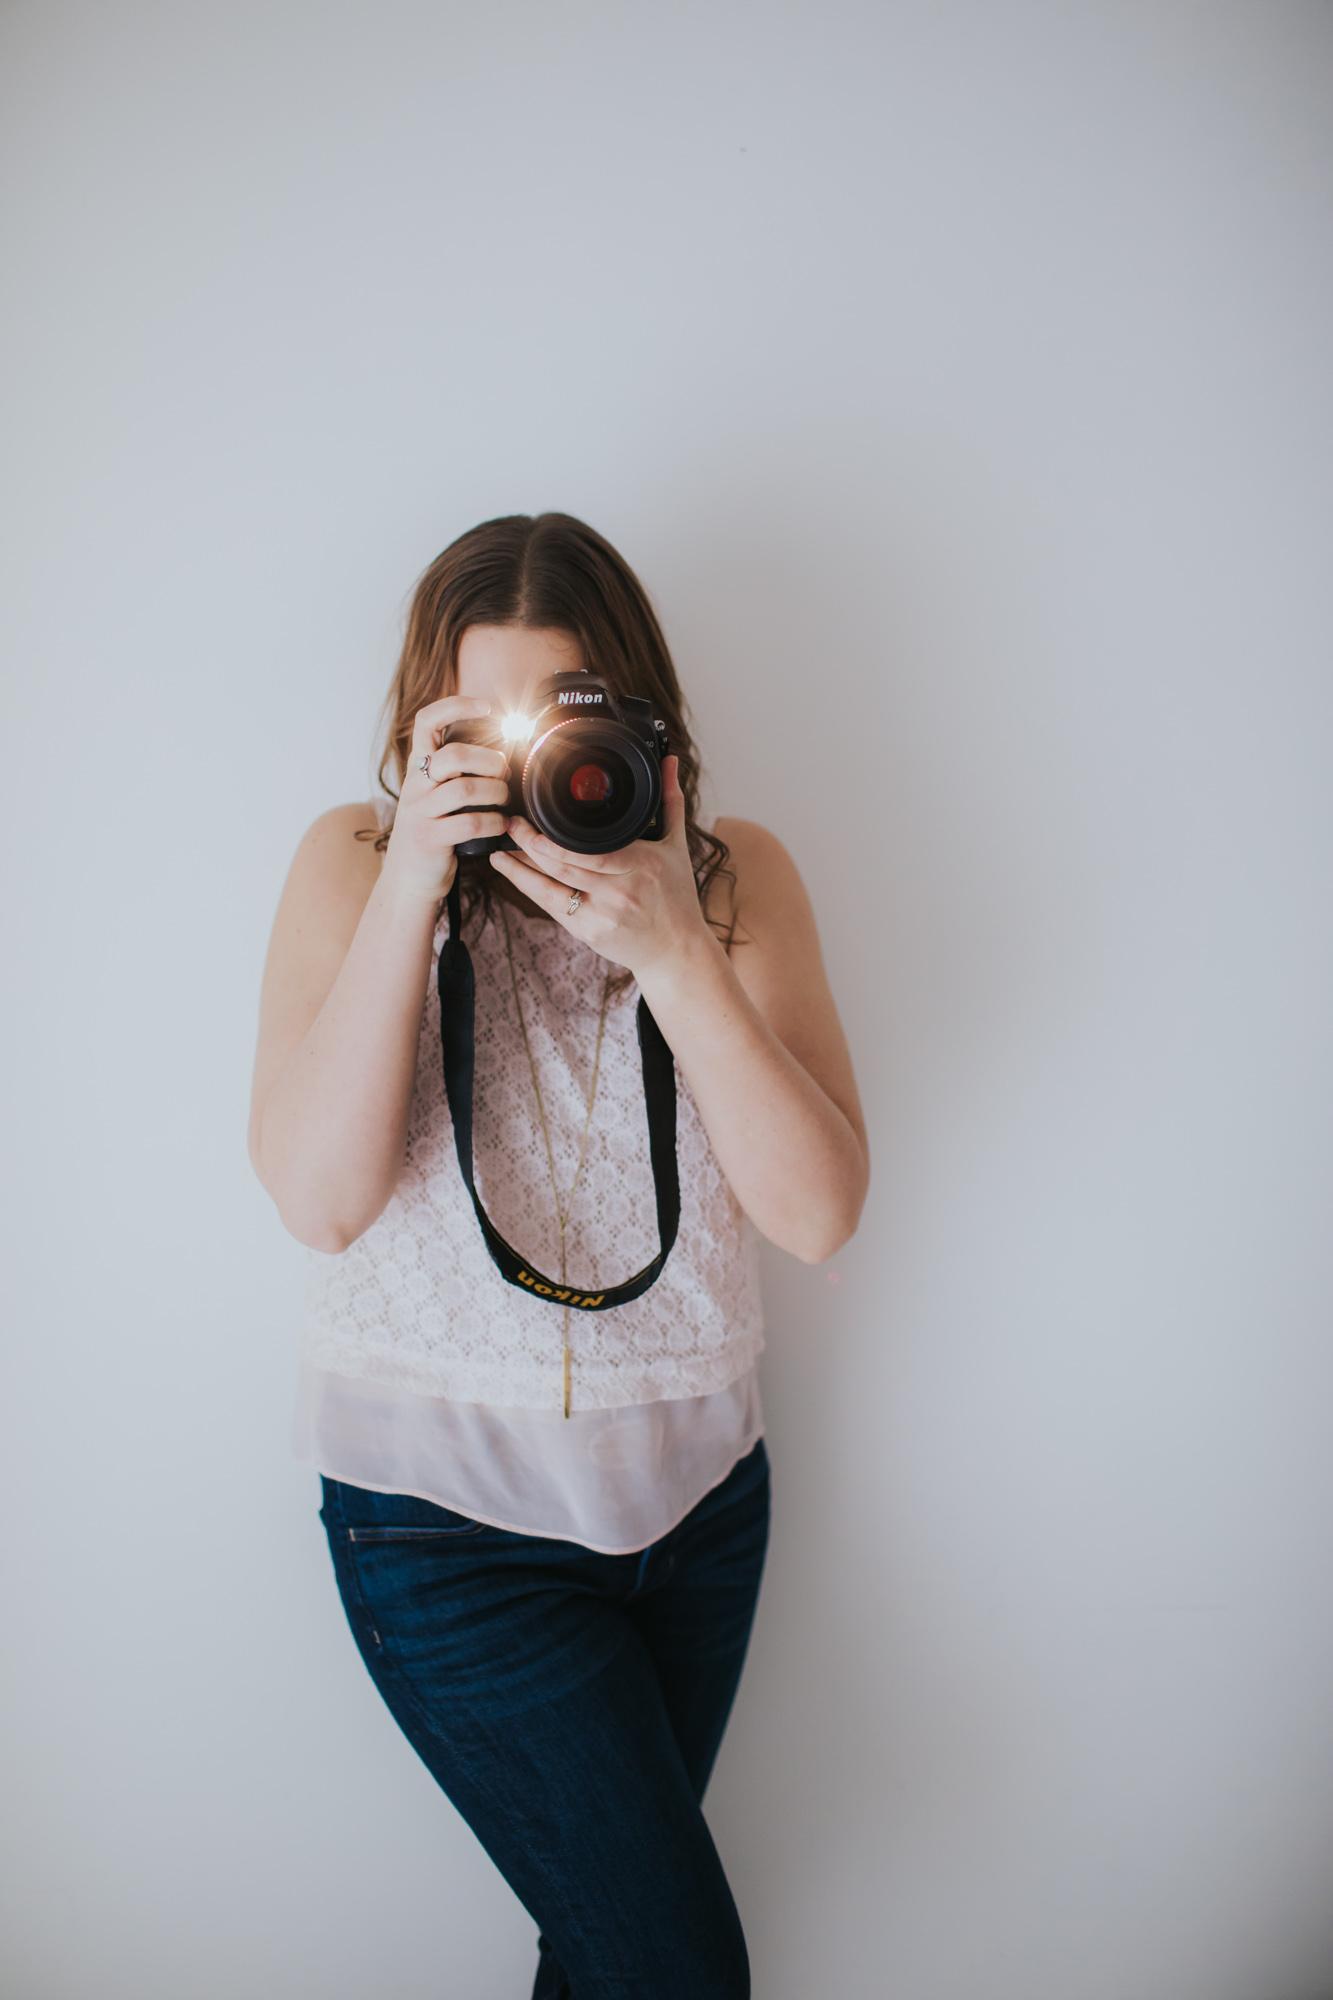 photographer-headshot-with-camera